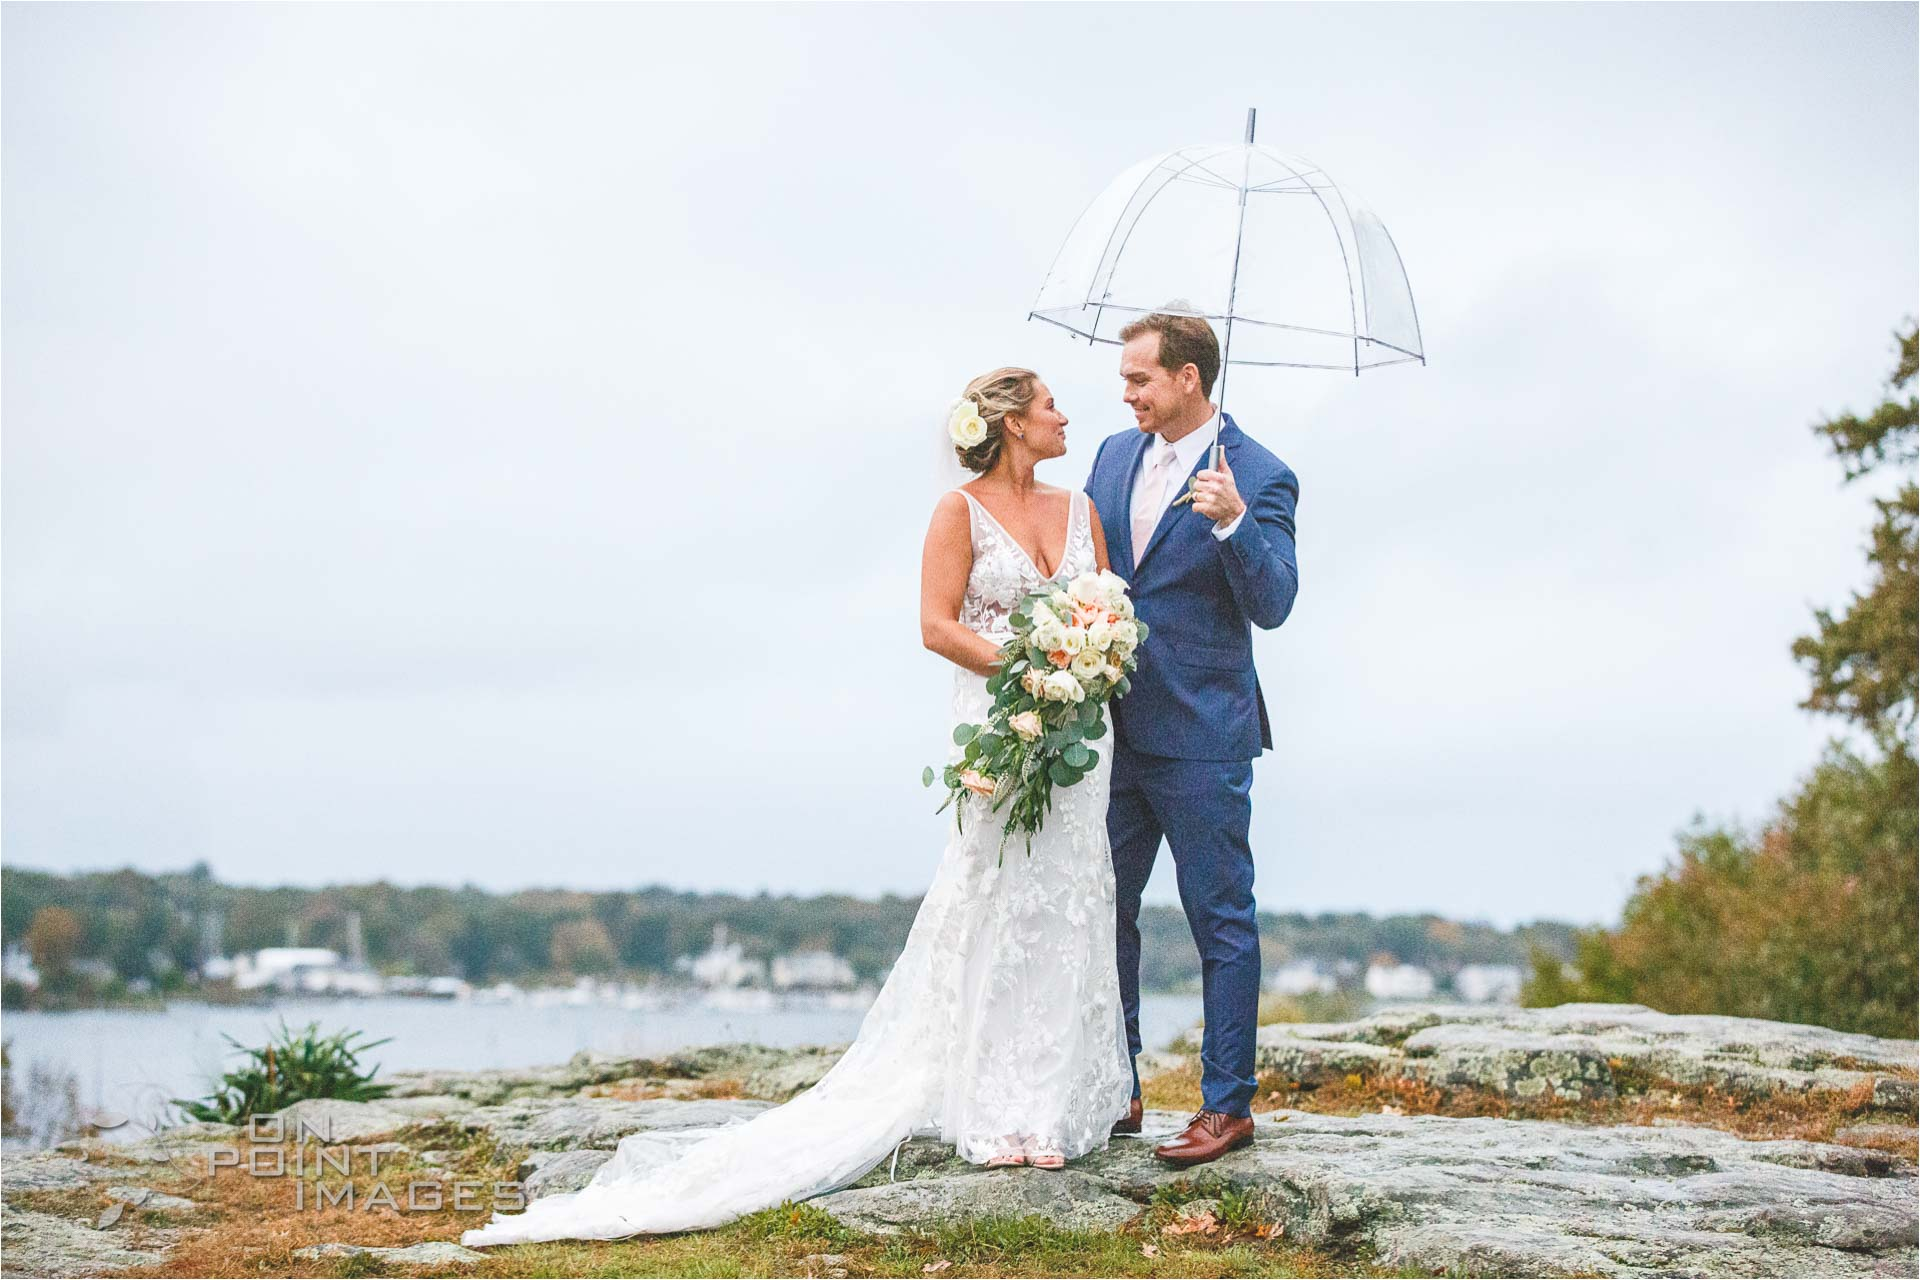 inn-at-mystic-wedding-photography-20.jpg